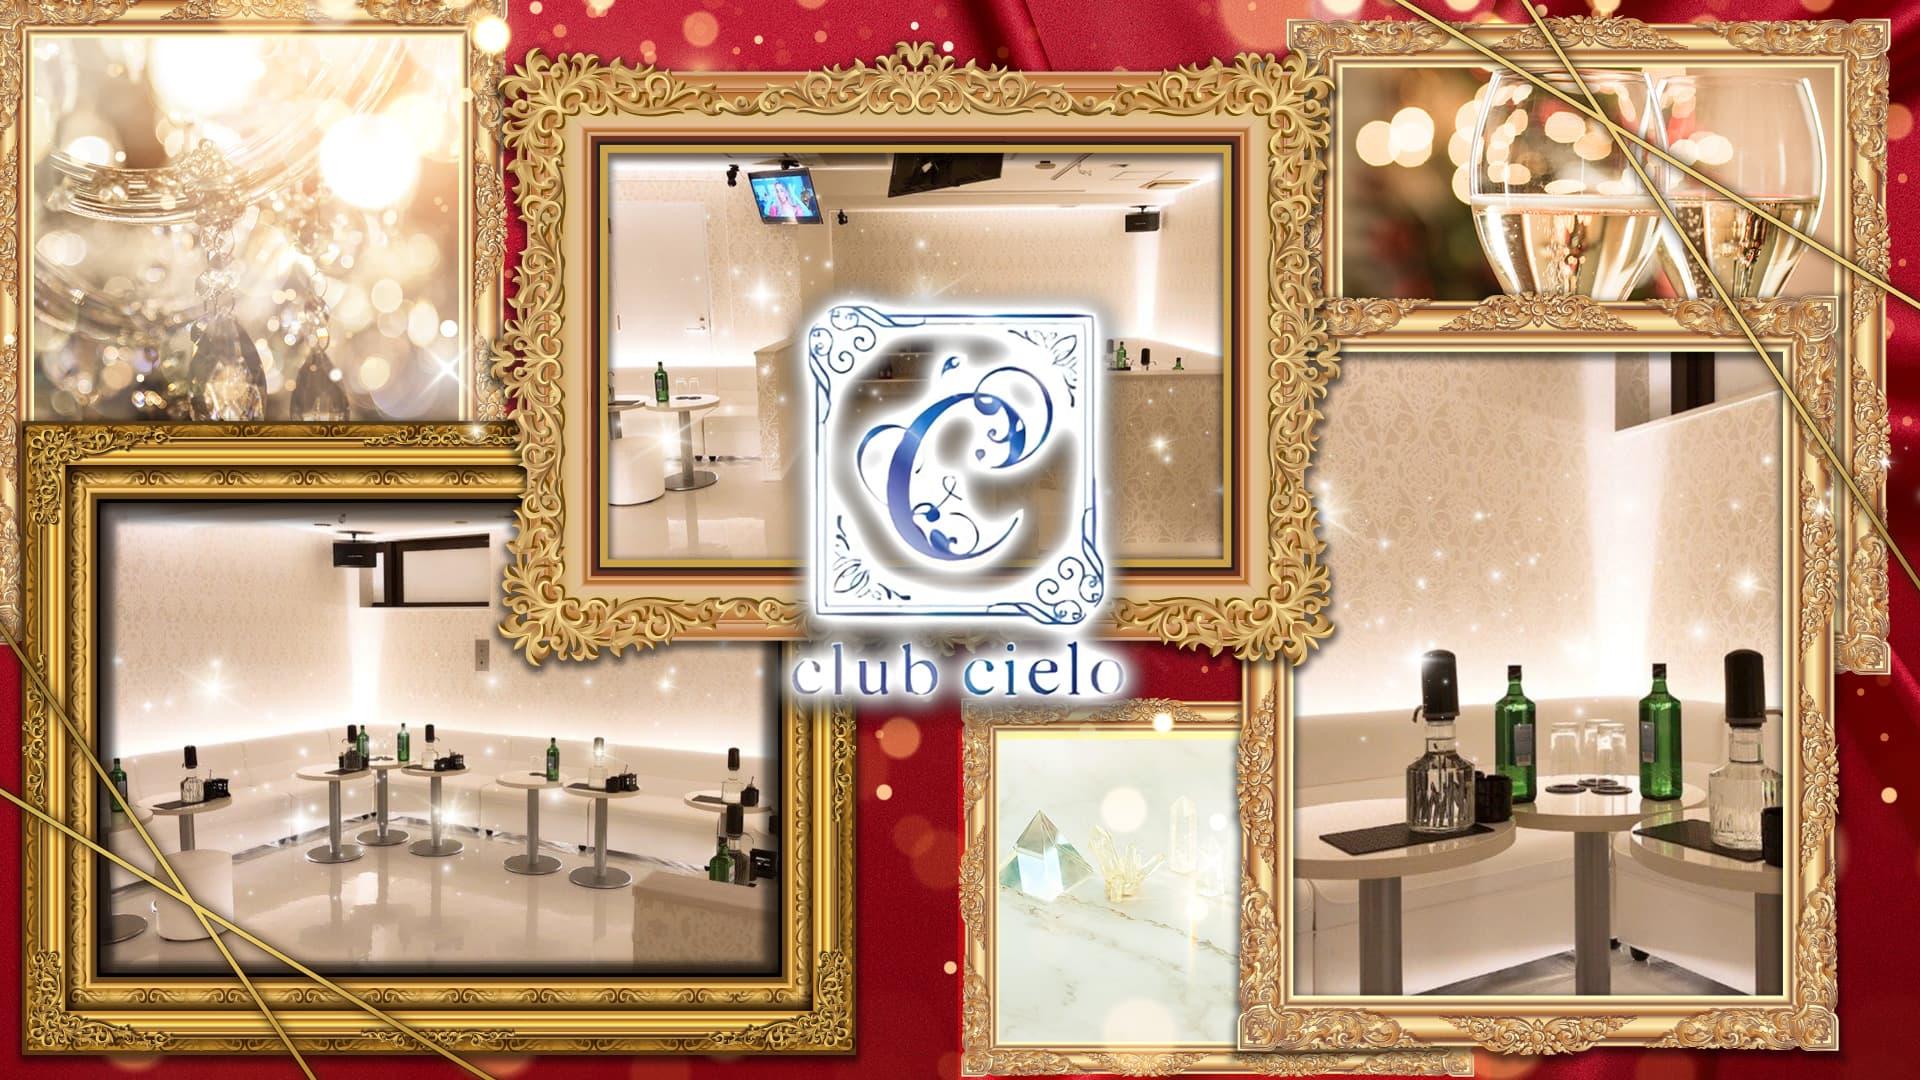 Club Cielo(クラブシエロ)【公式求人・体入情報】 川越キャバクラ TOP画像